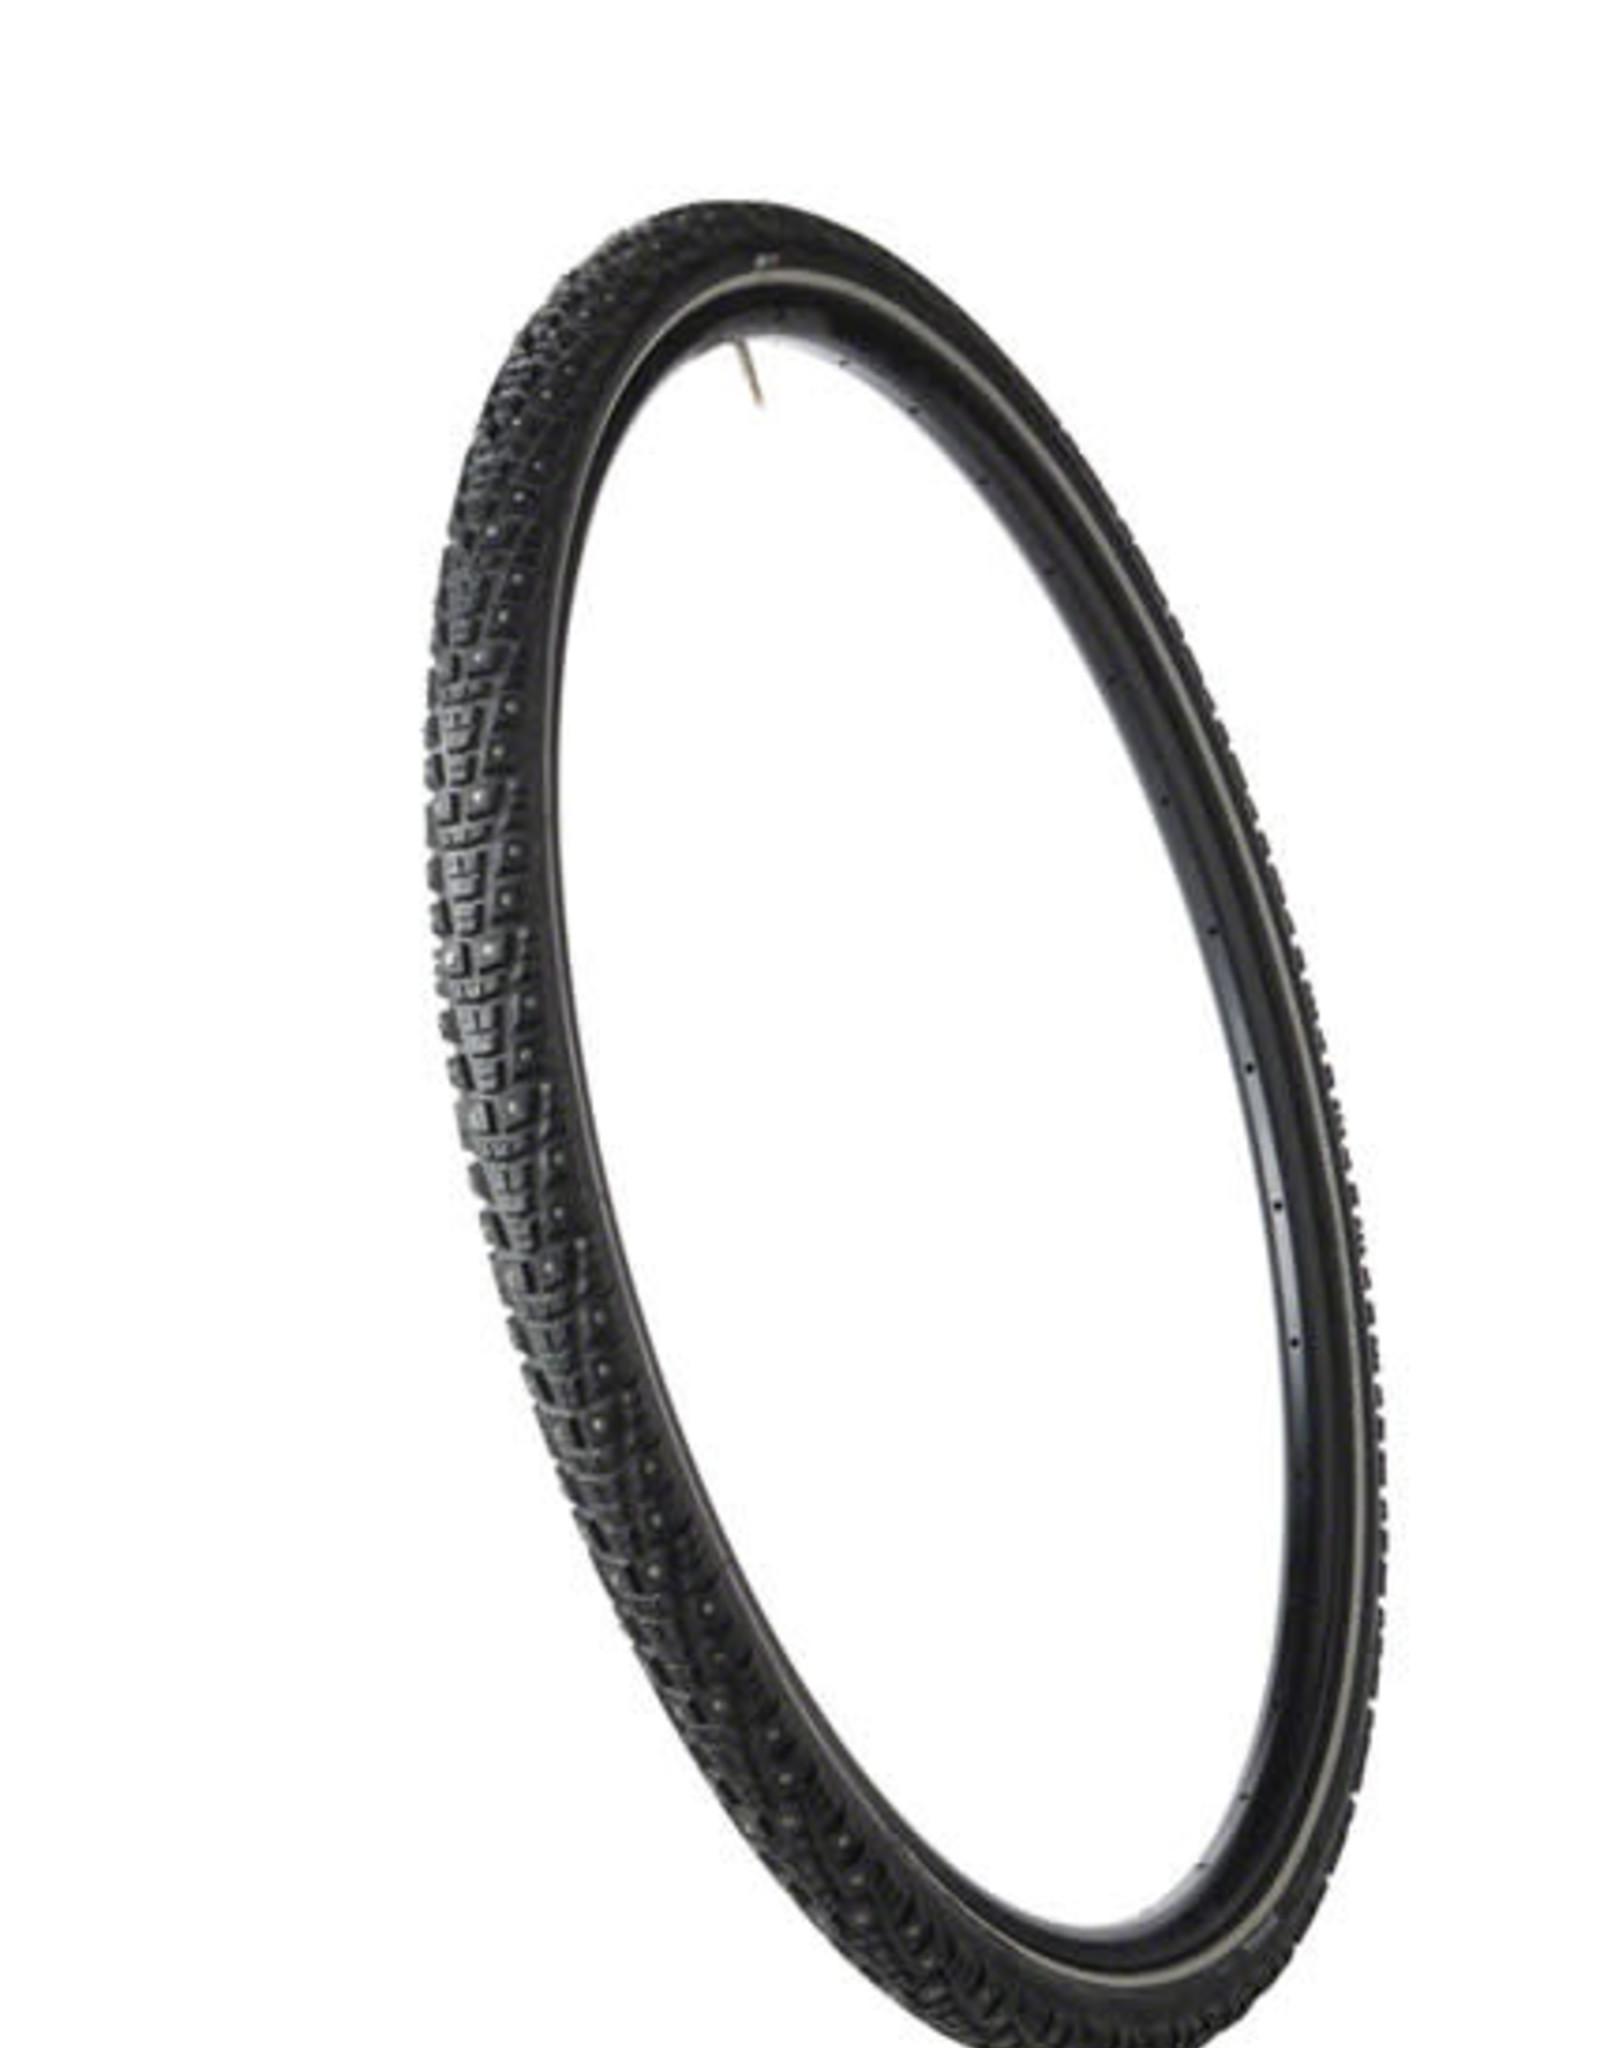 45NRTH 45NRTH Gravdal Tire - 700 x 38, Clincher, Steel, Black, 33tpi, 252 Carbide Steel Studs